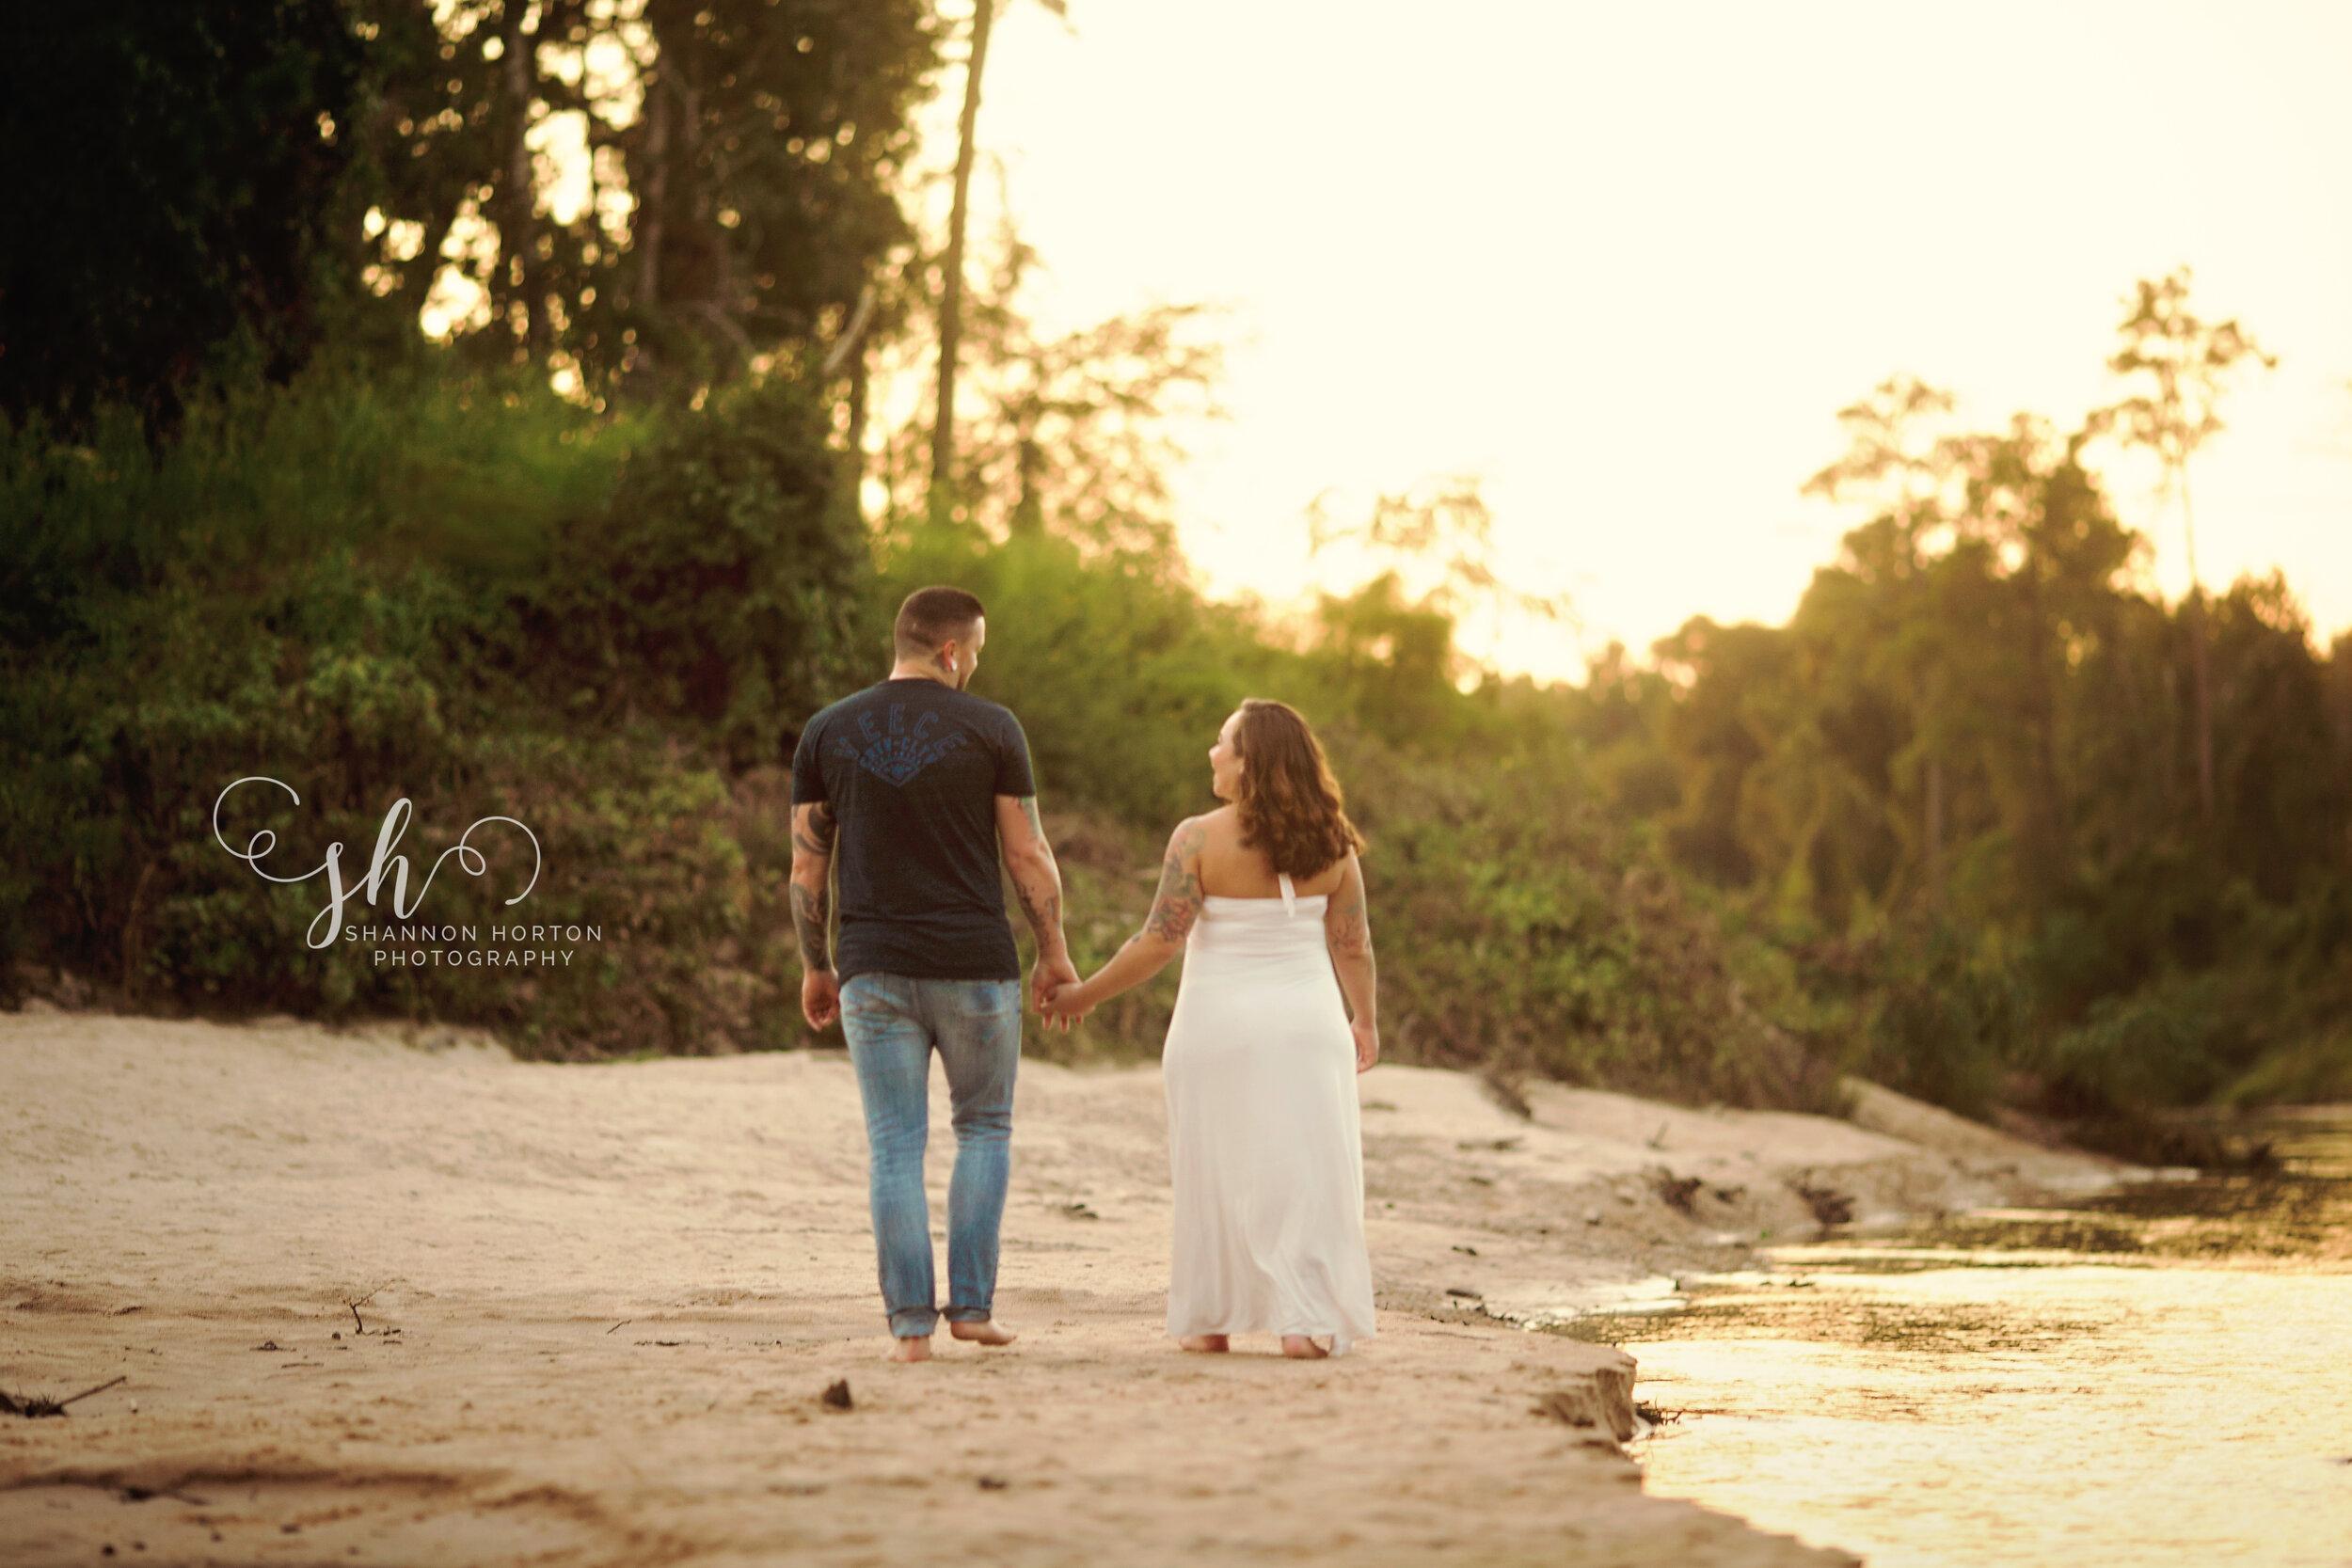 husband-and-wife-walking-along-creek-bank